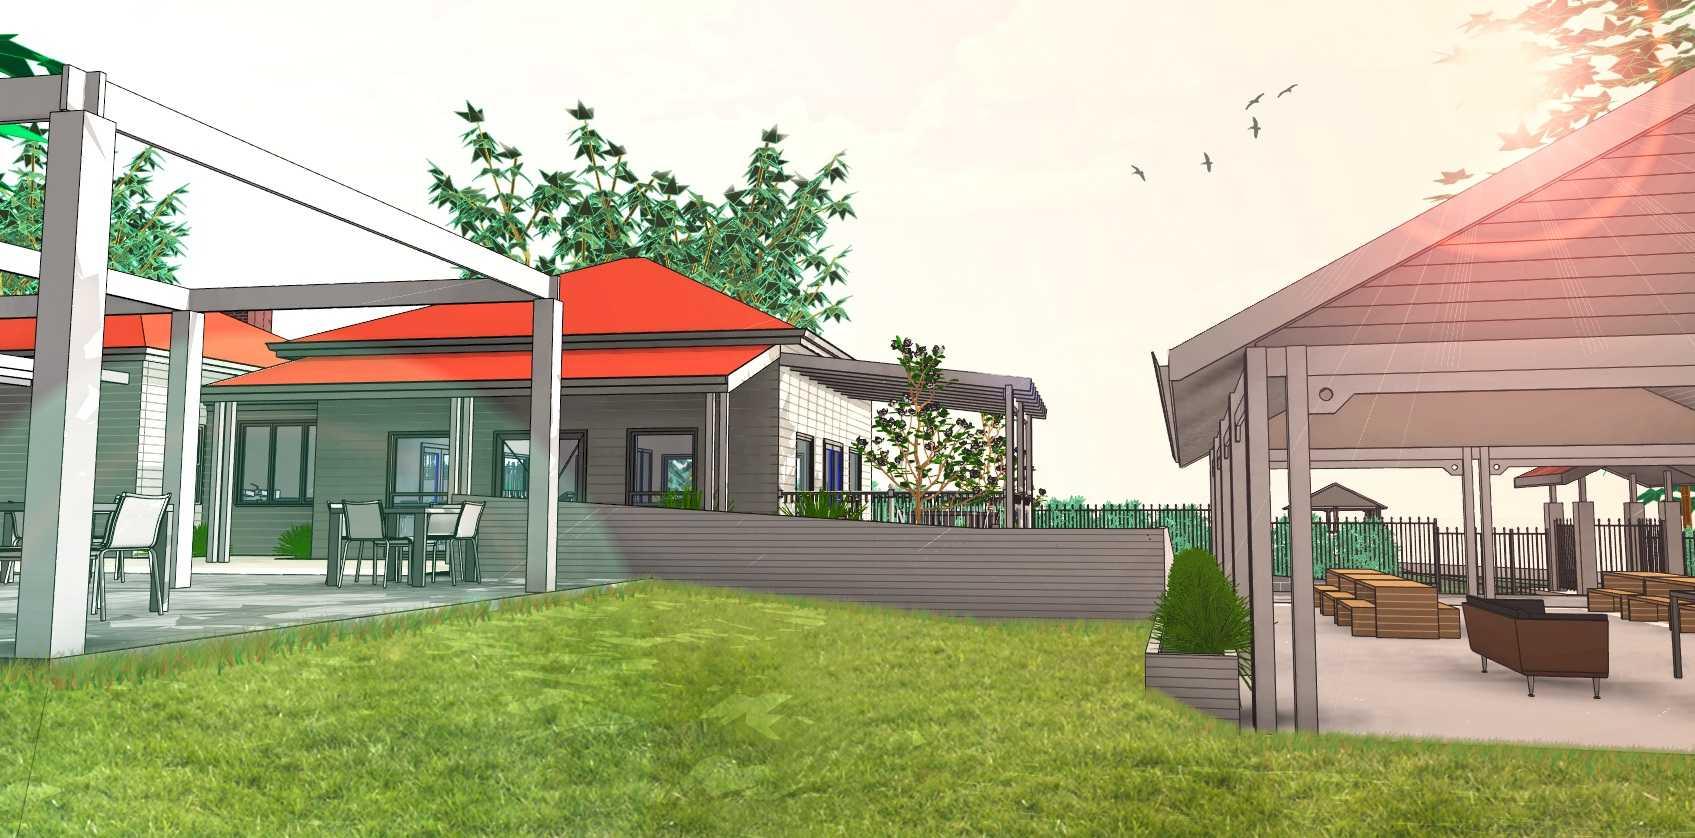 Plans to expand Gabbinbar Homestead